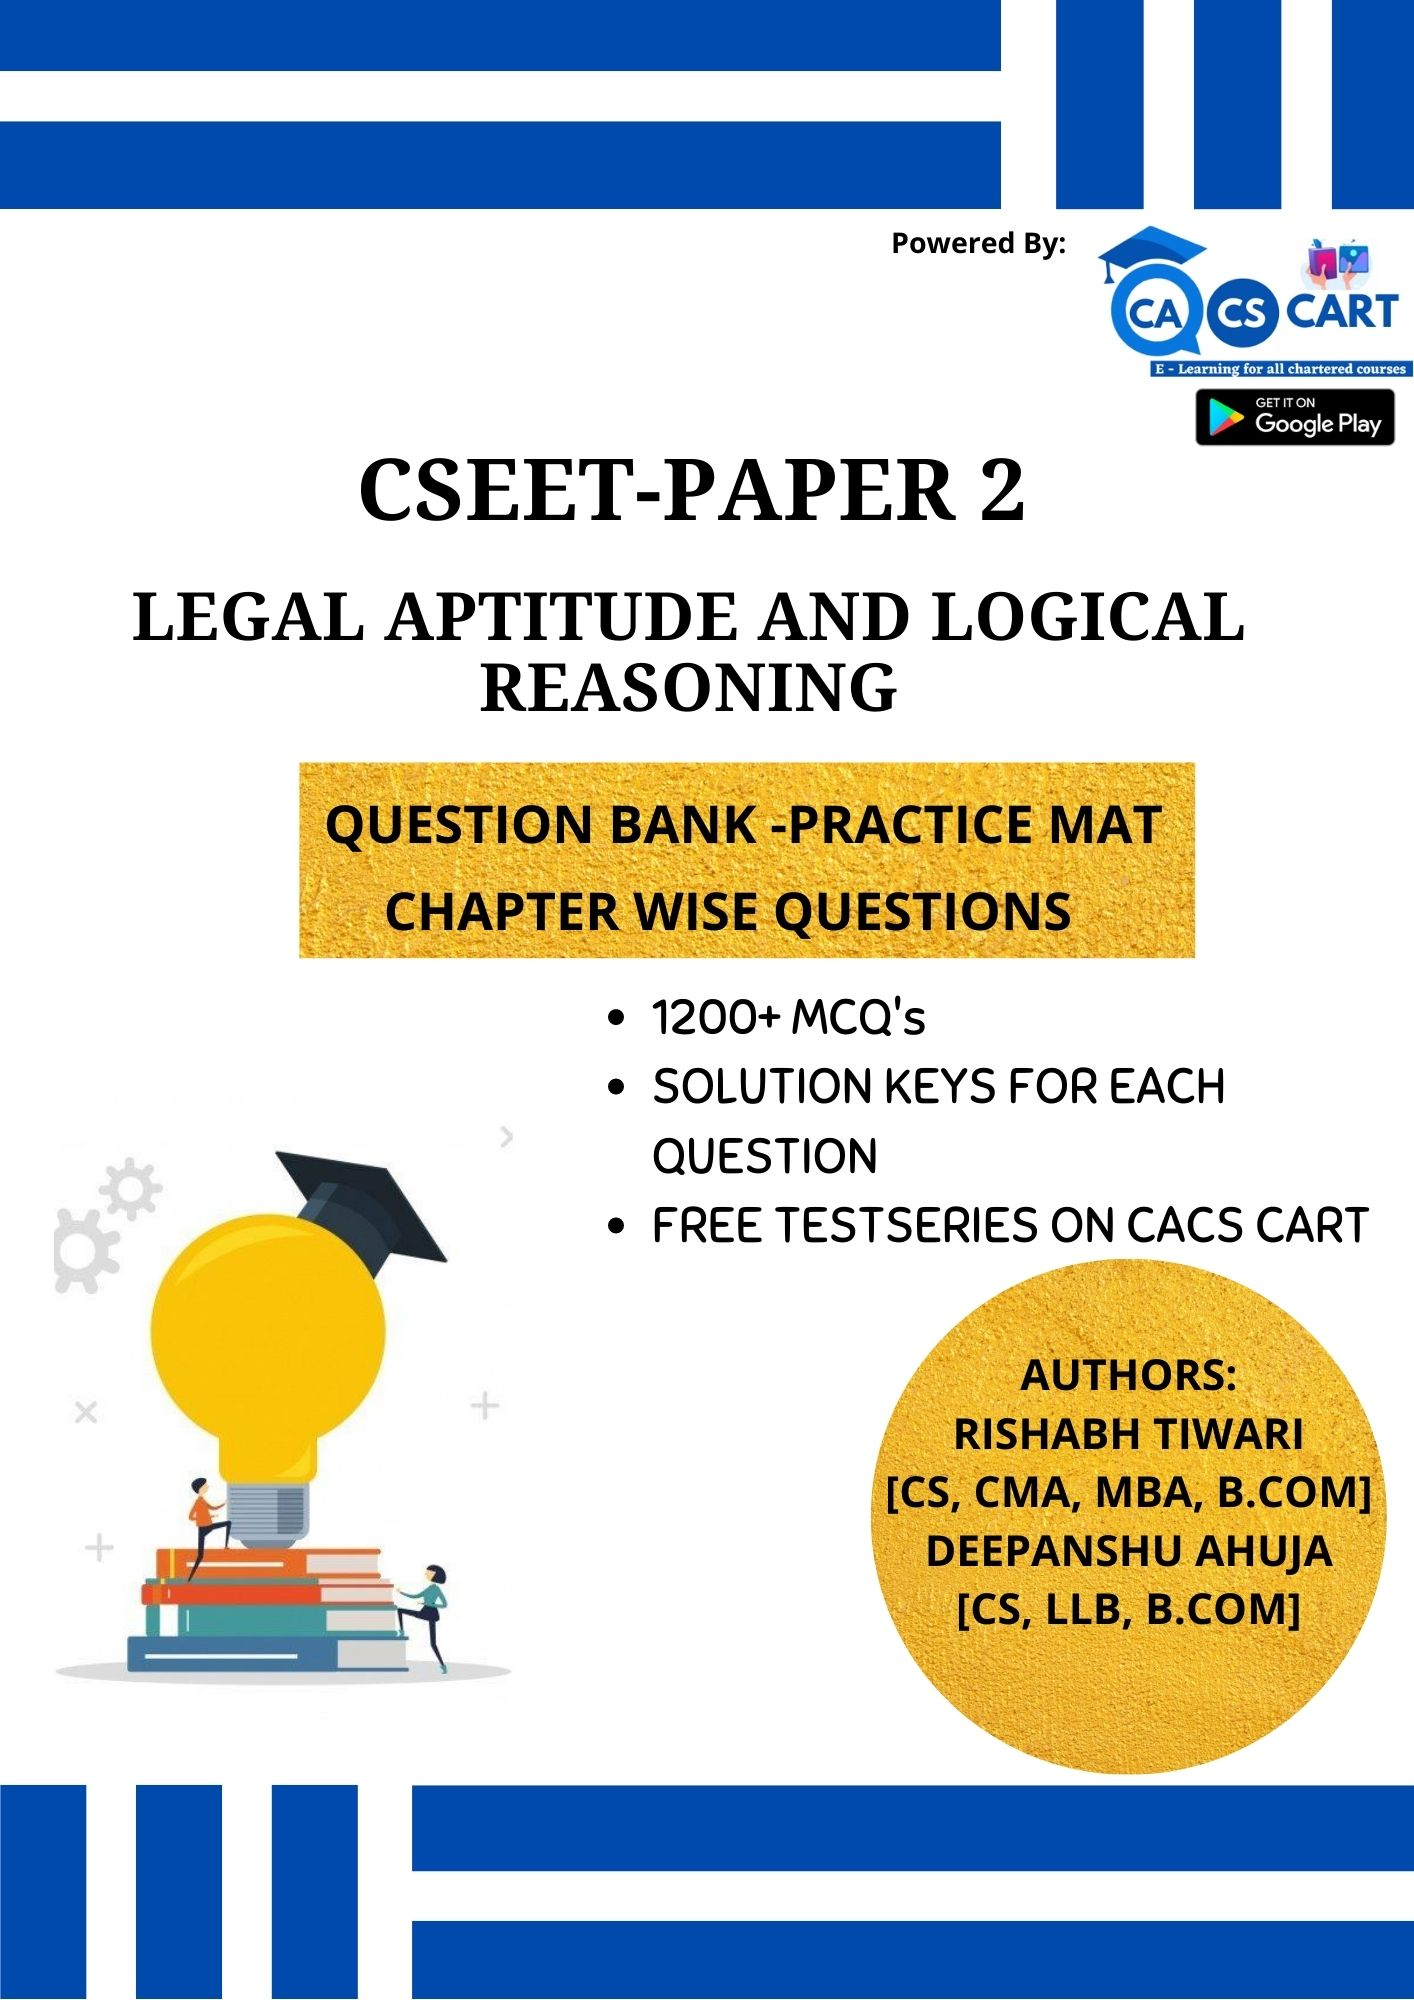 CSEET PAPER 2 - Legal Aptitude and Logical Reasoning Practice Mat